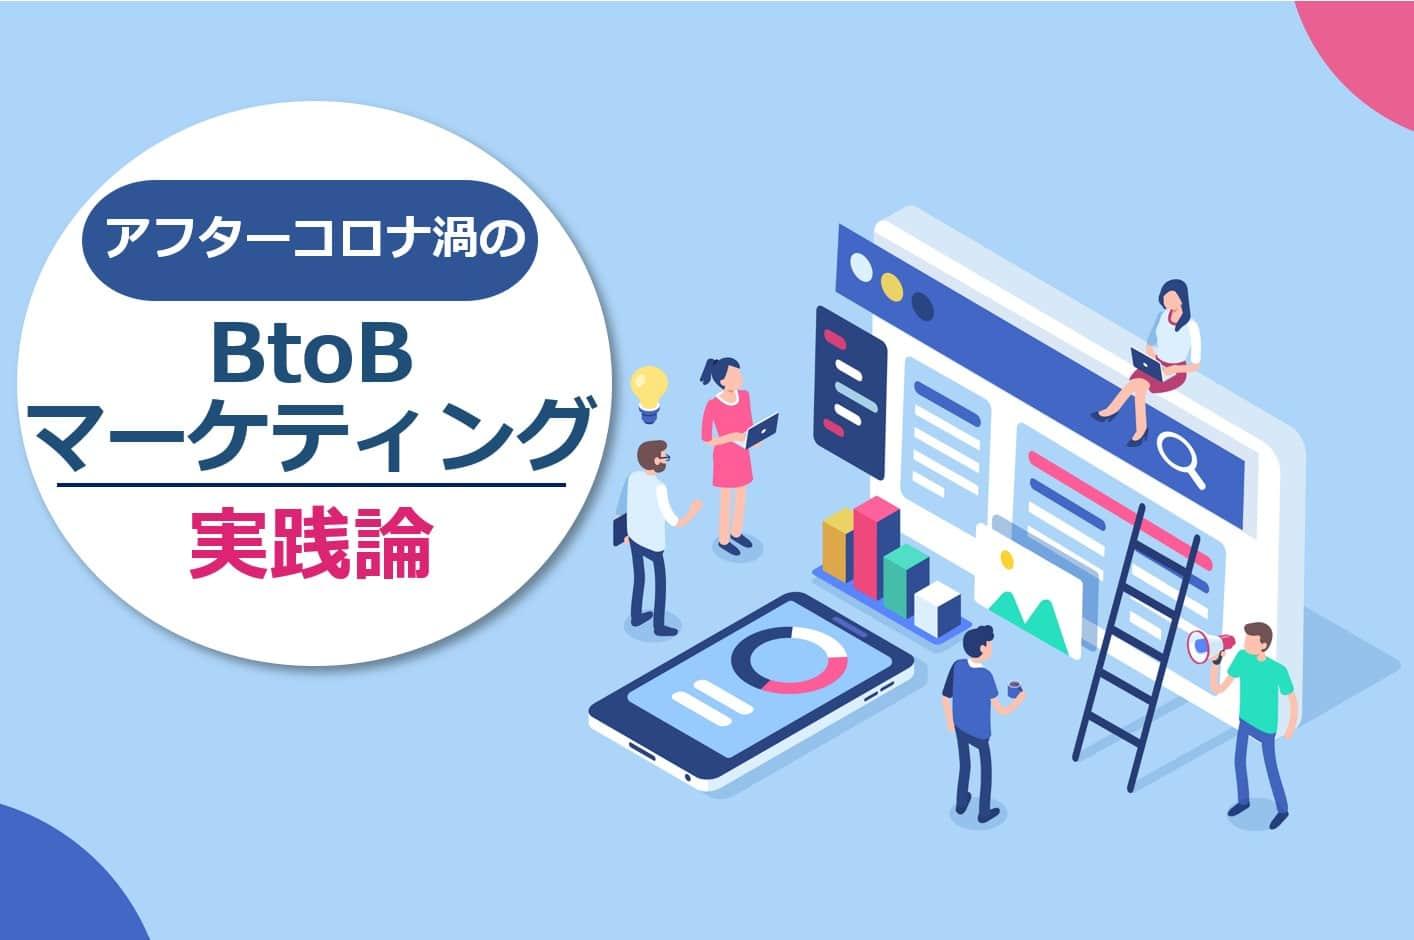 BtoBマーケティング実践論